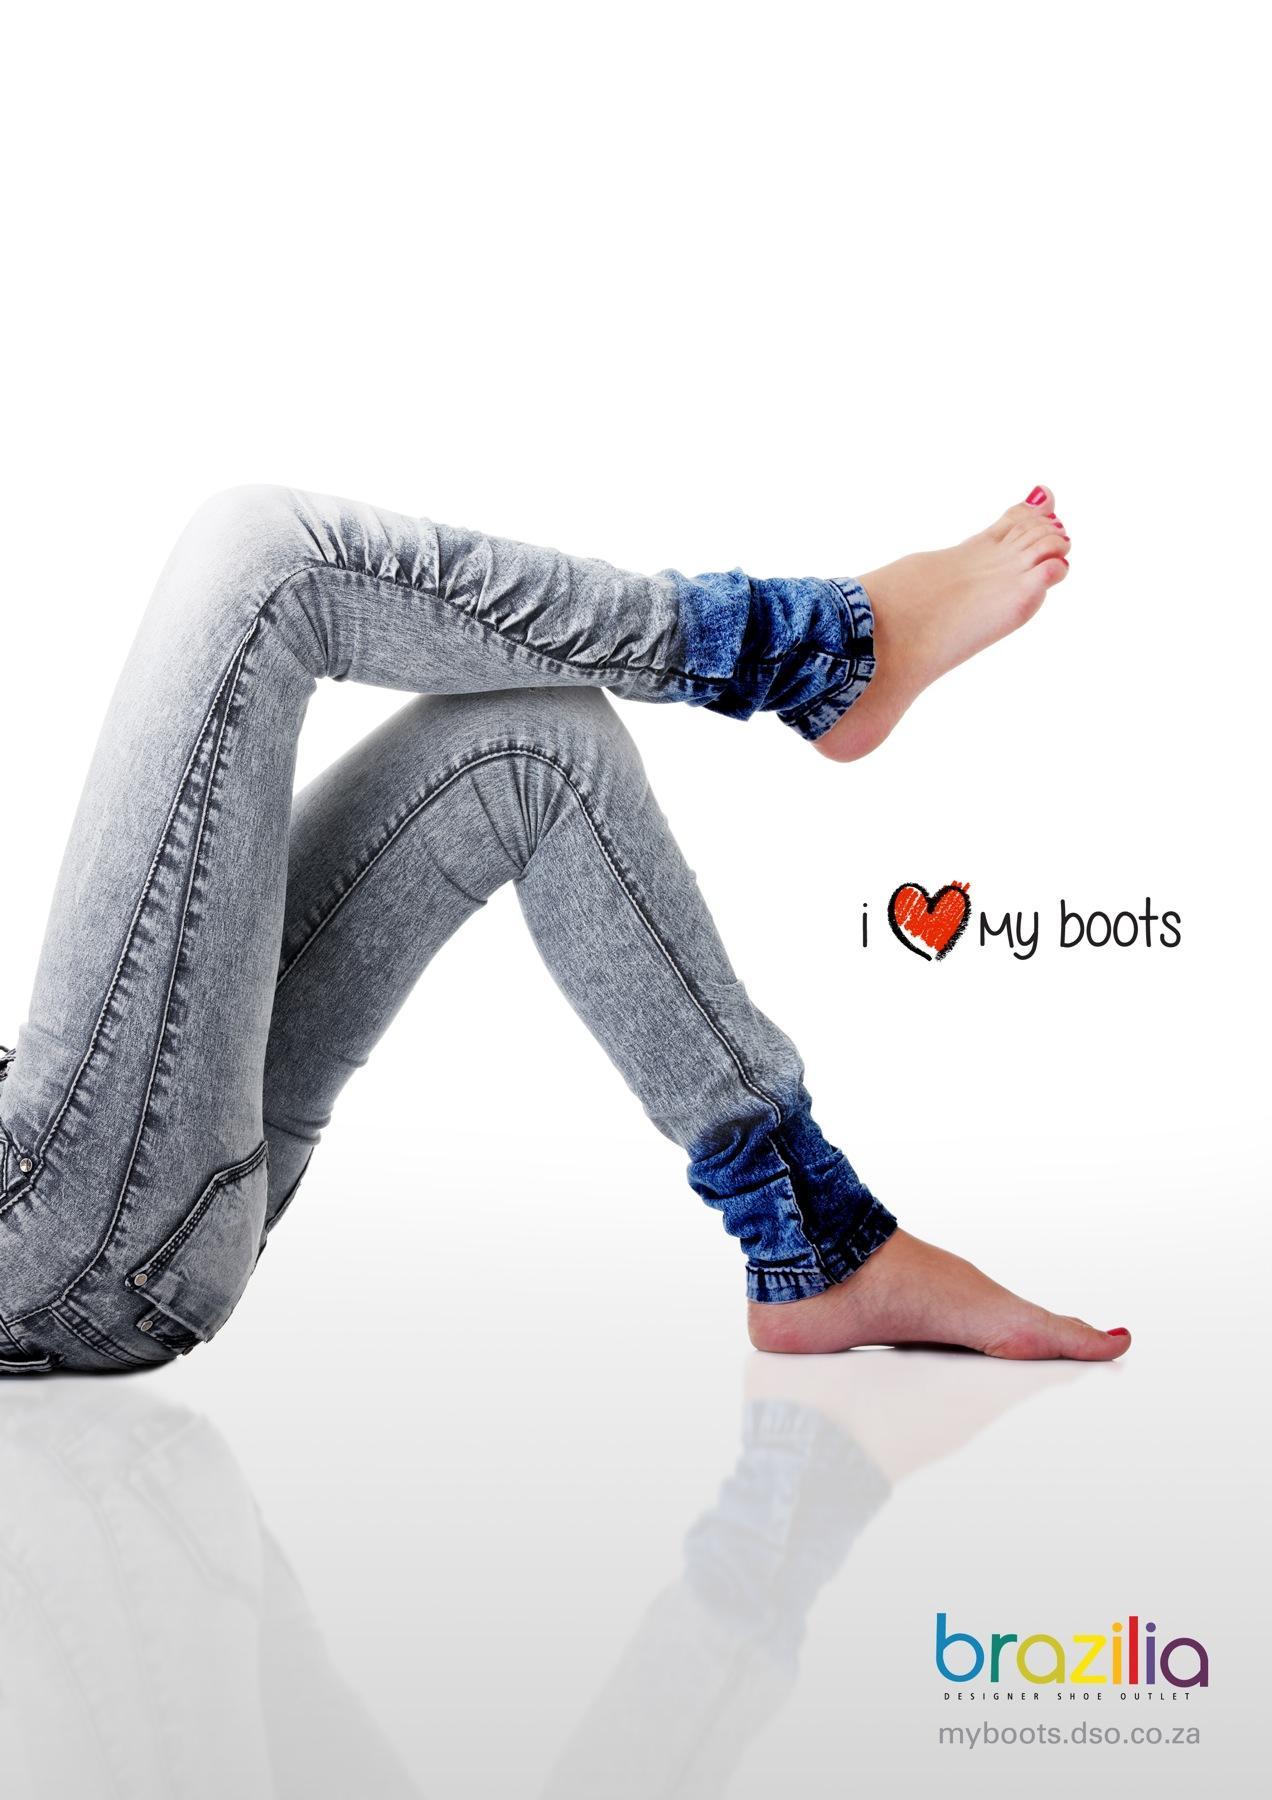 Brazilia Print Ad -  I Love My Boots, 1